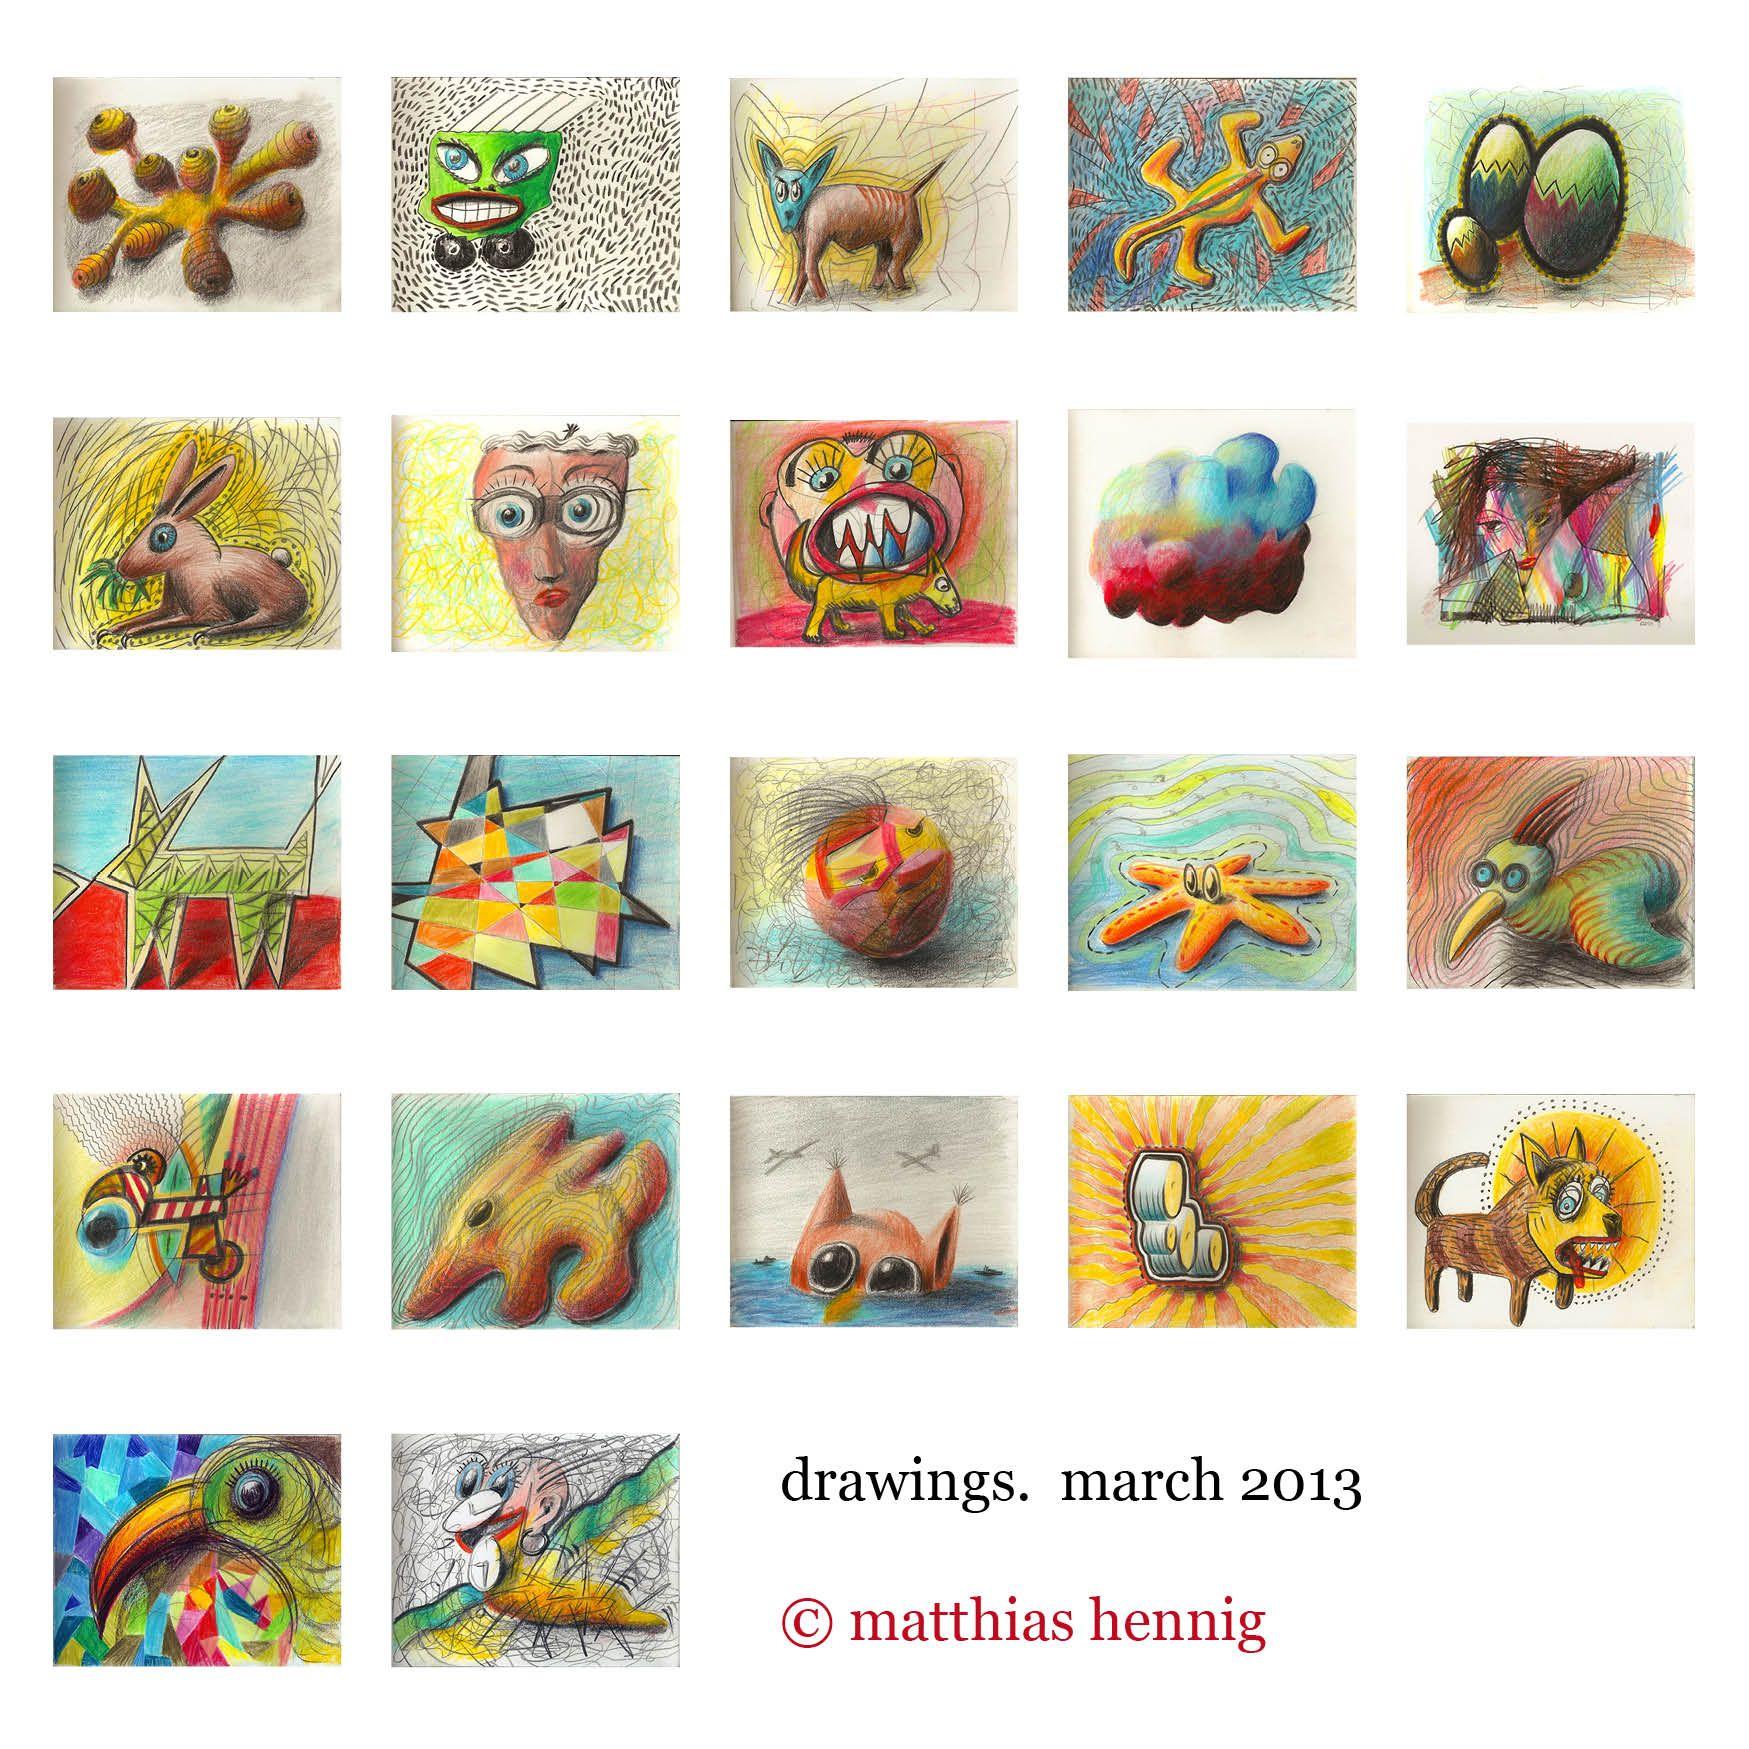 drawings on paper, each 12 x 15 cm, march 2013, #matthias #hennig #artwork #illustration ©matthias hennig 2013